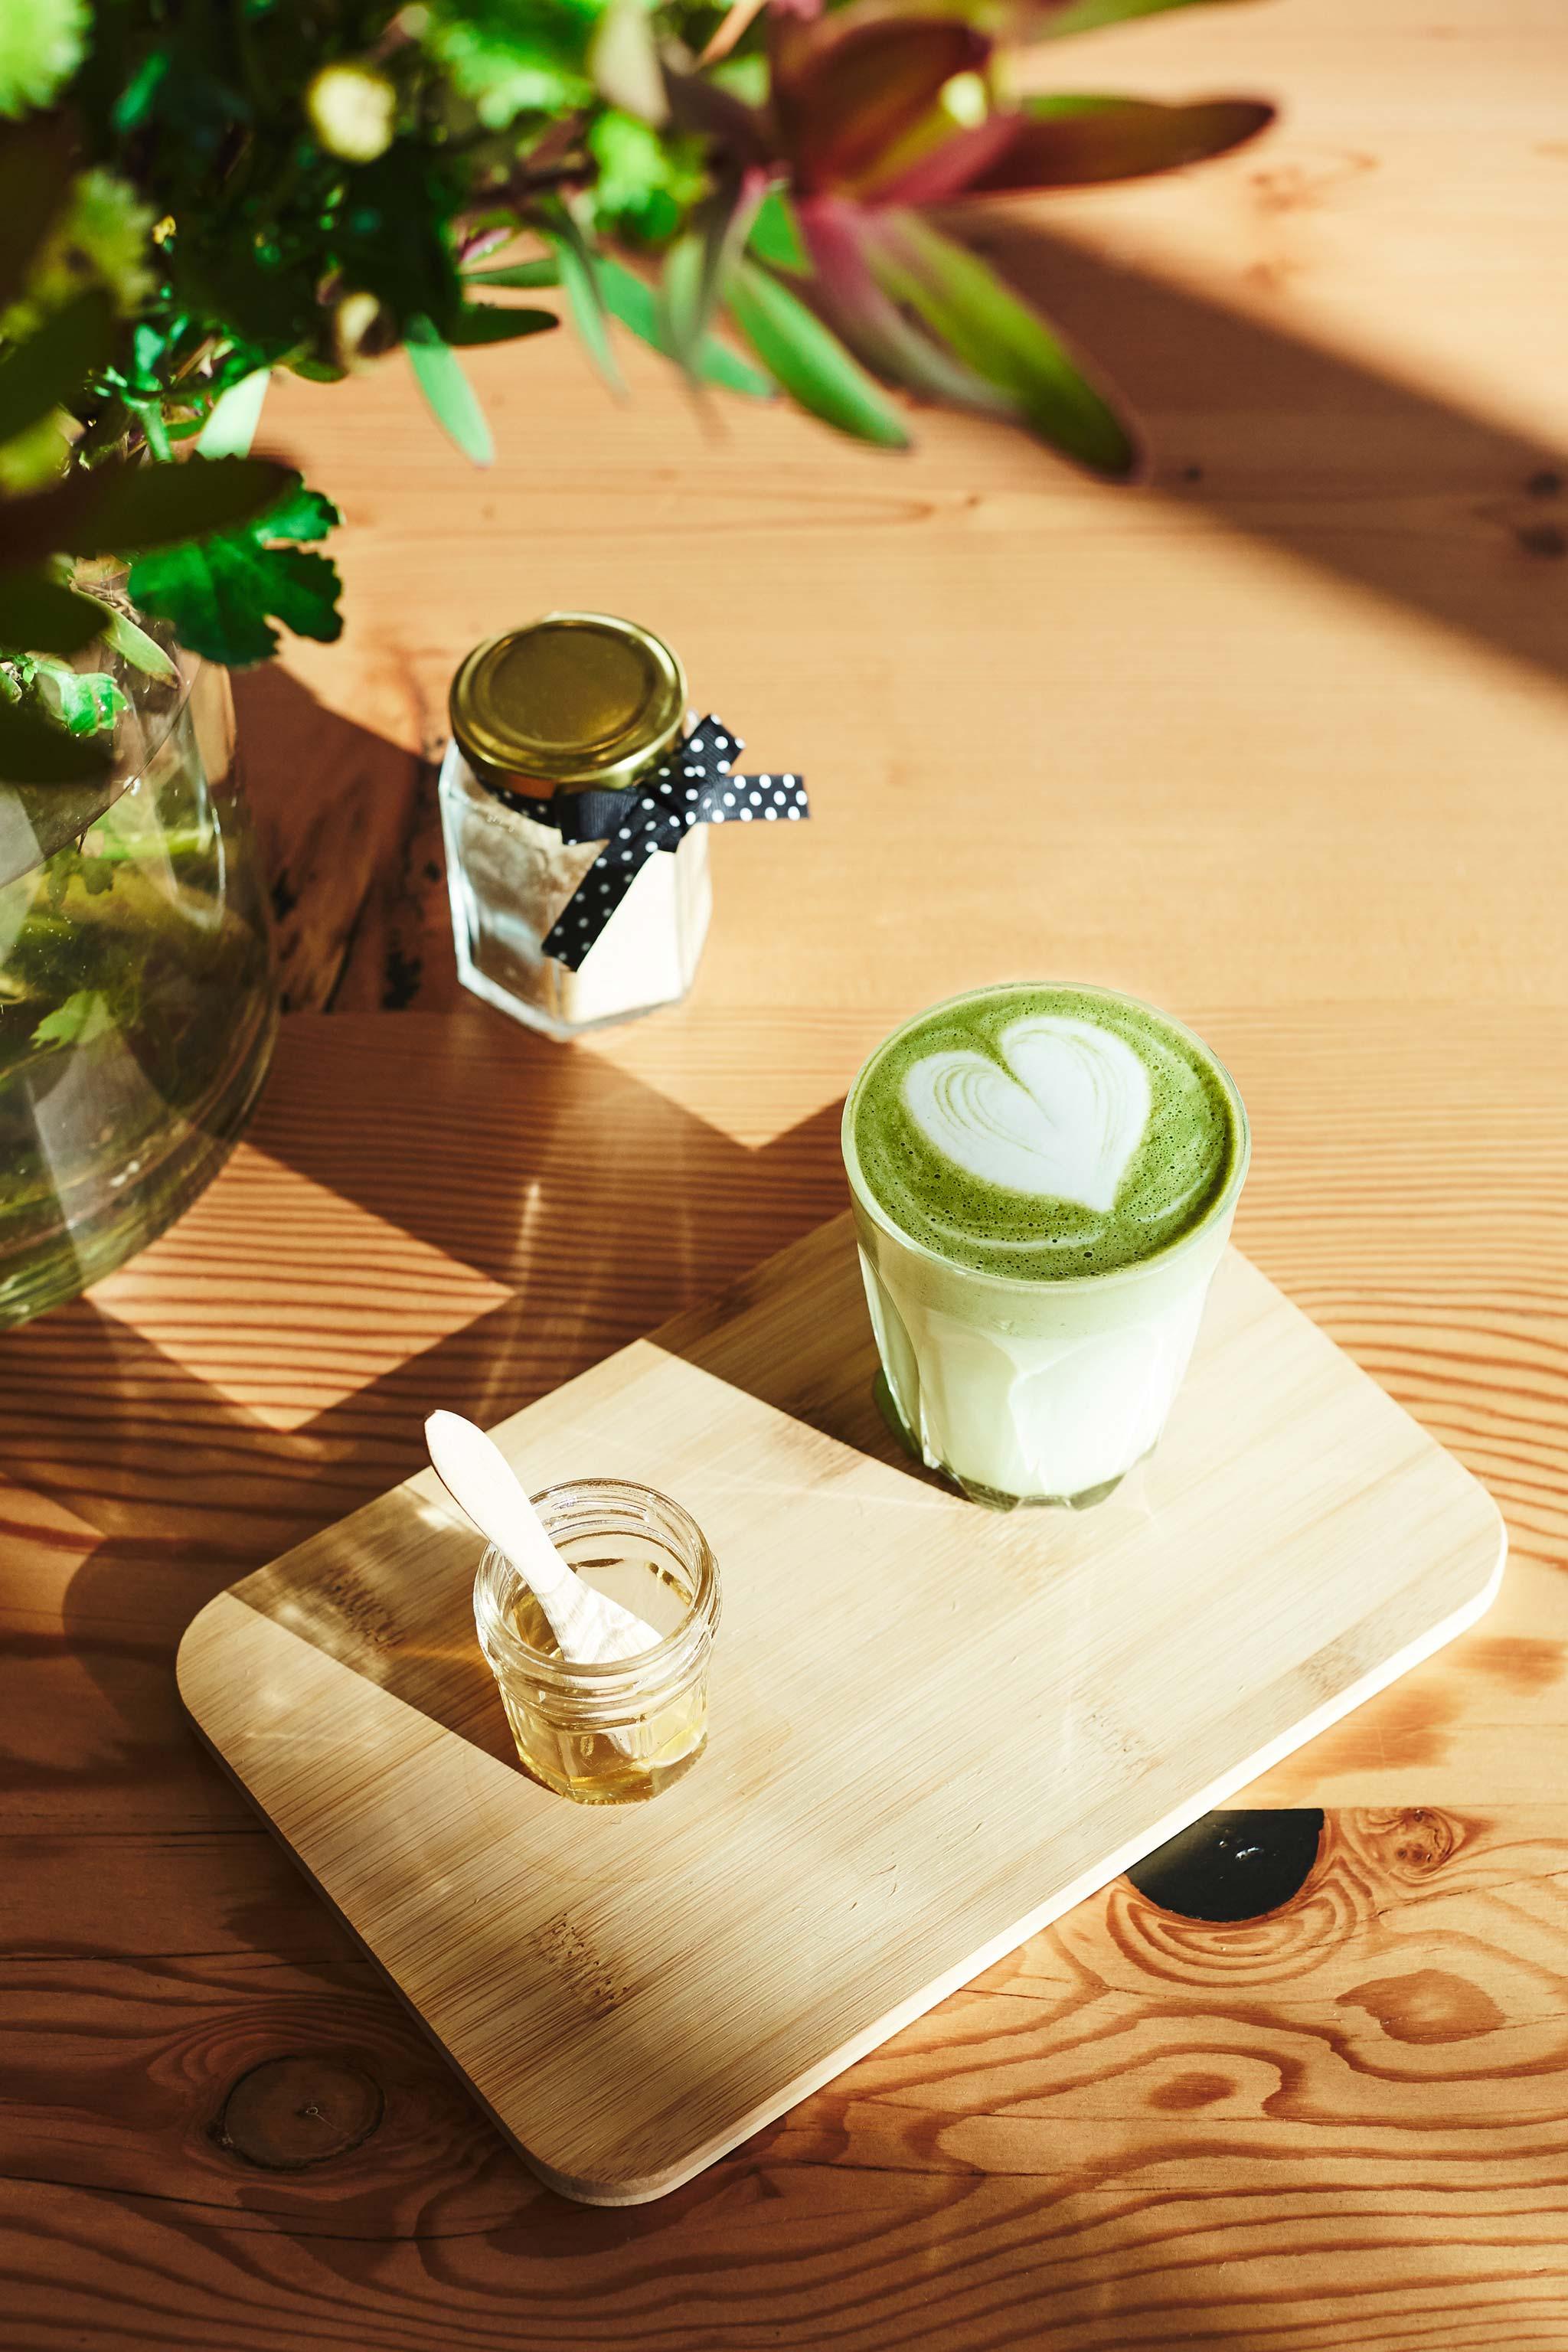 templestowe-lifestyle-photographer-salted-caramel-macha-latte